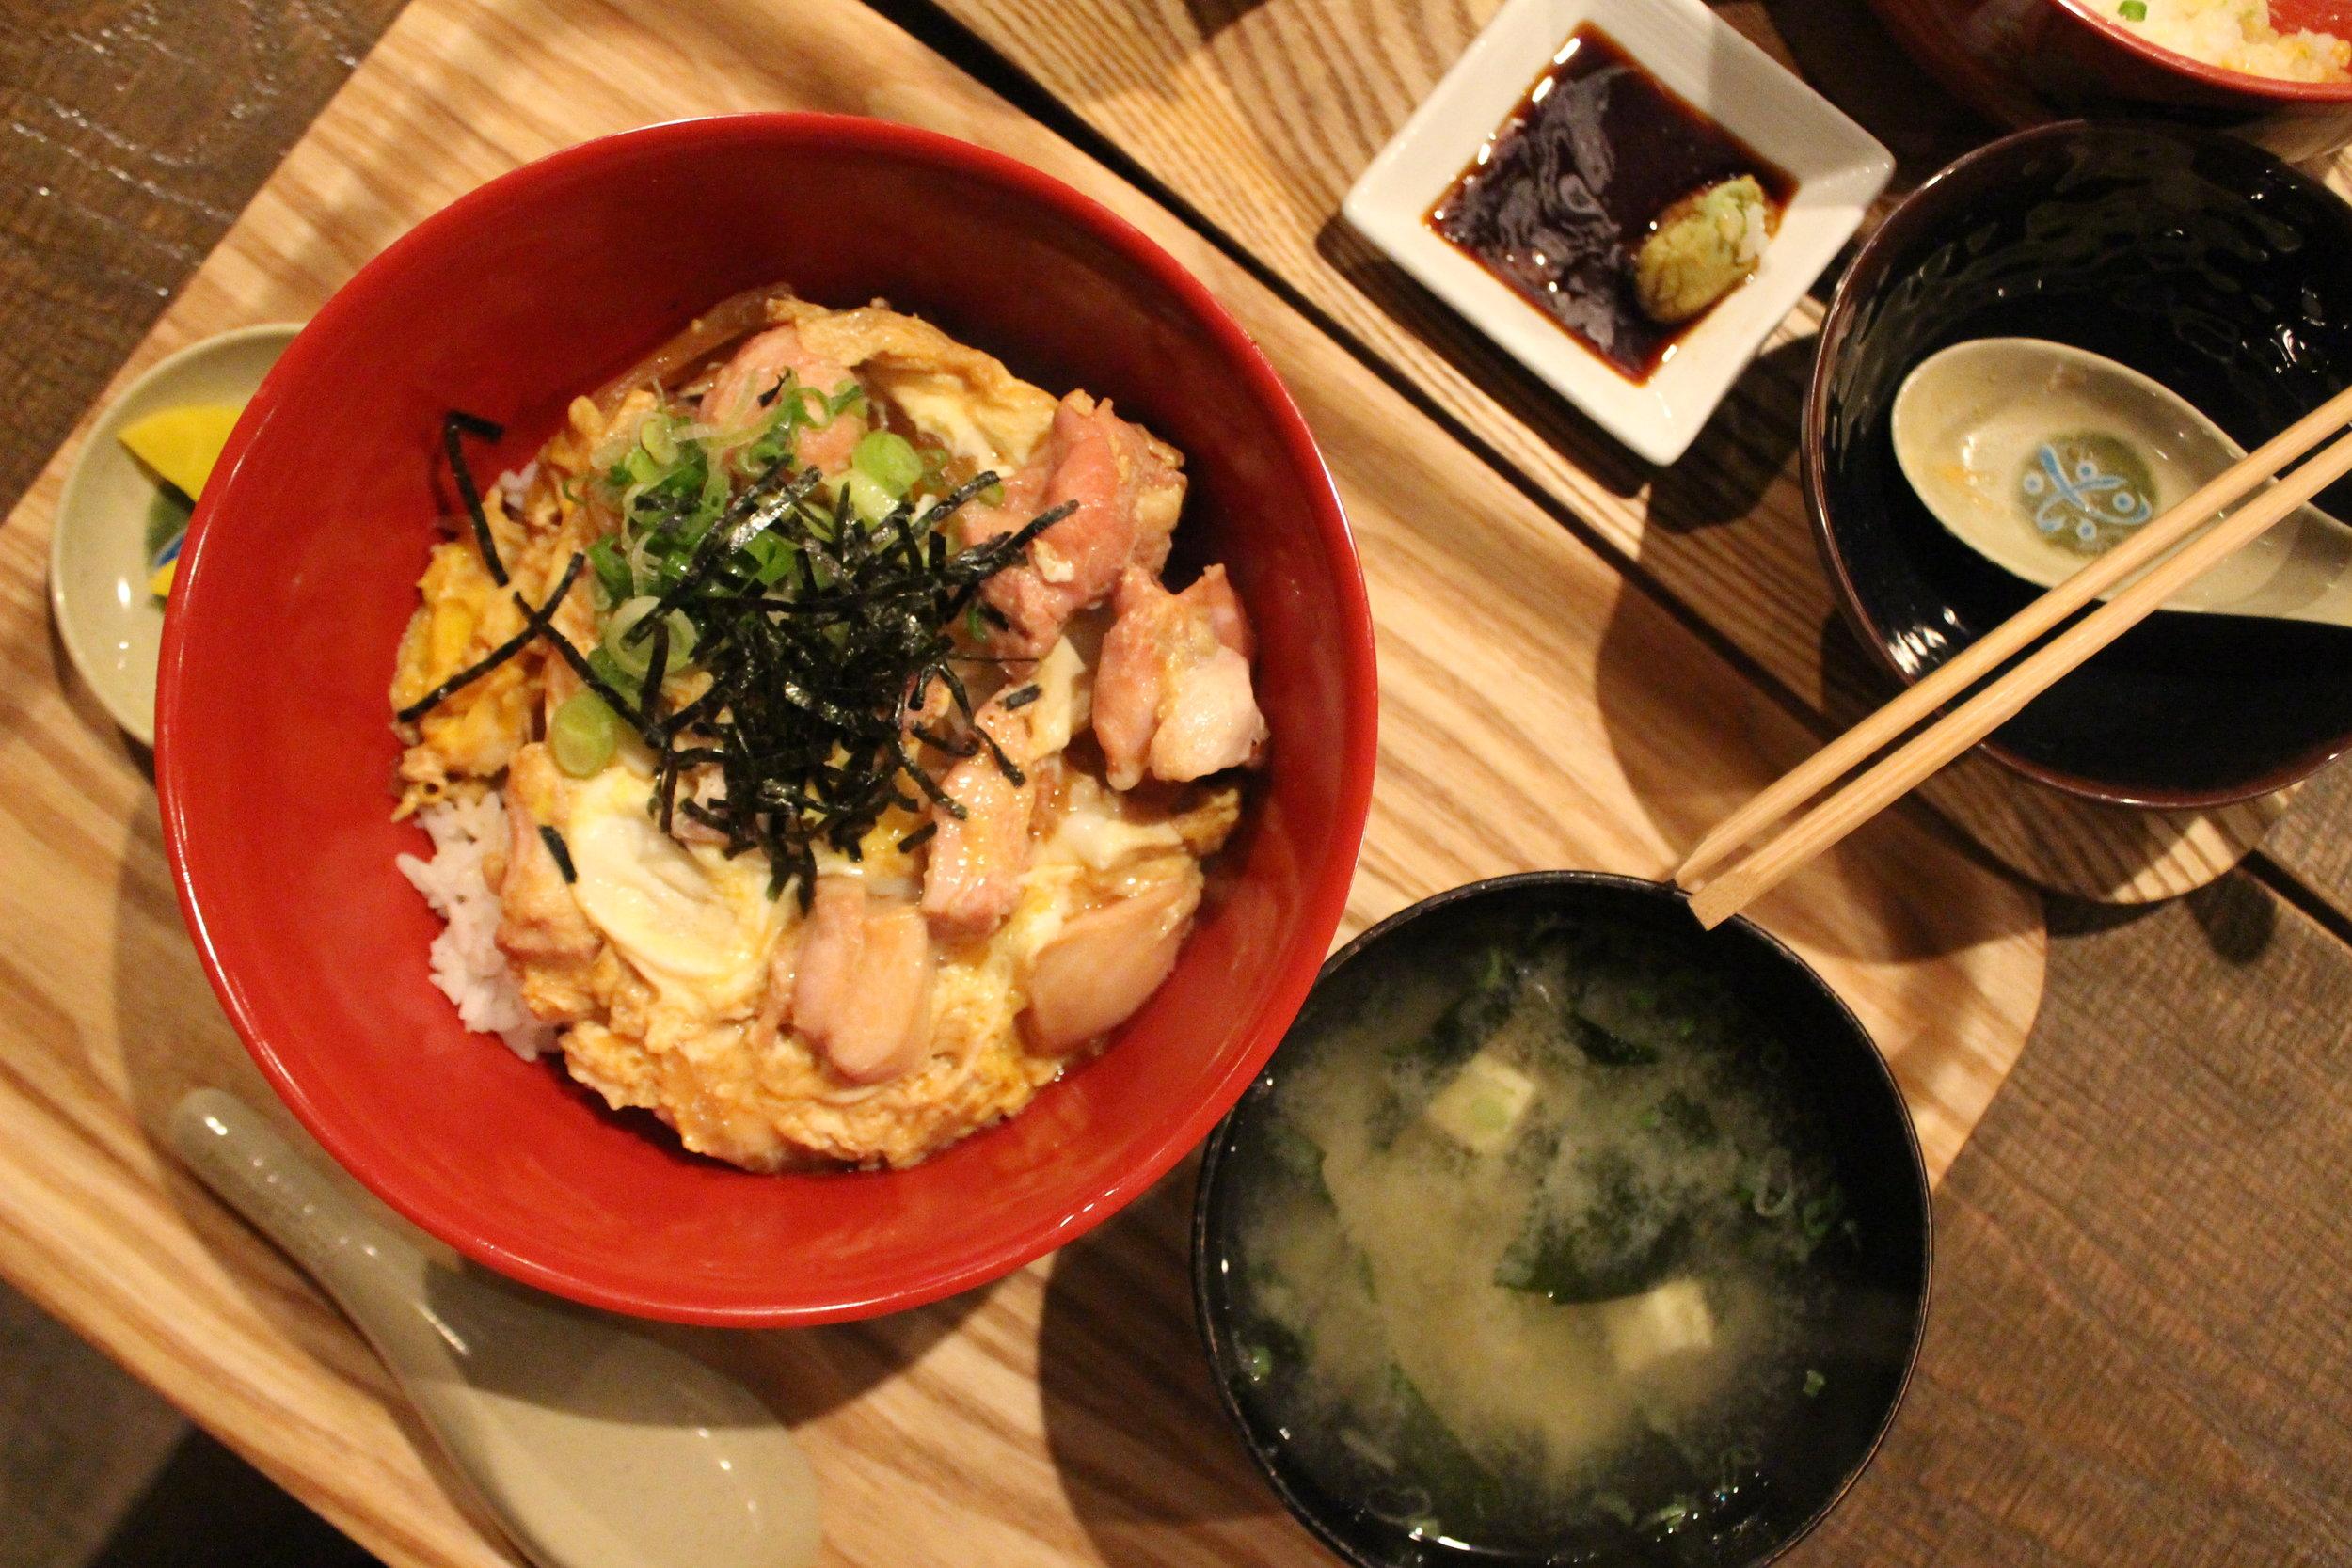 Oyako Don: Simmered Chicken and Egg over rice at Izakaya Mew